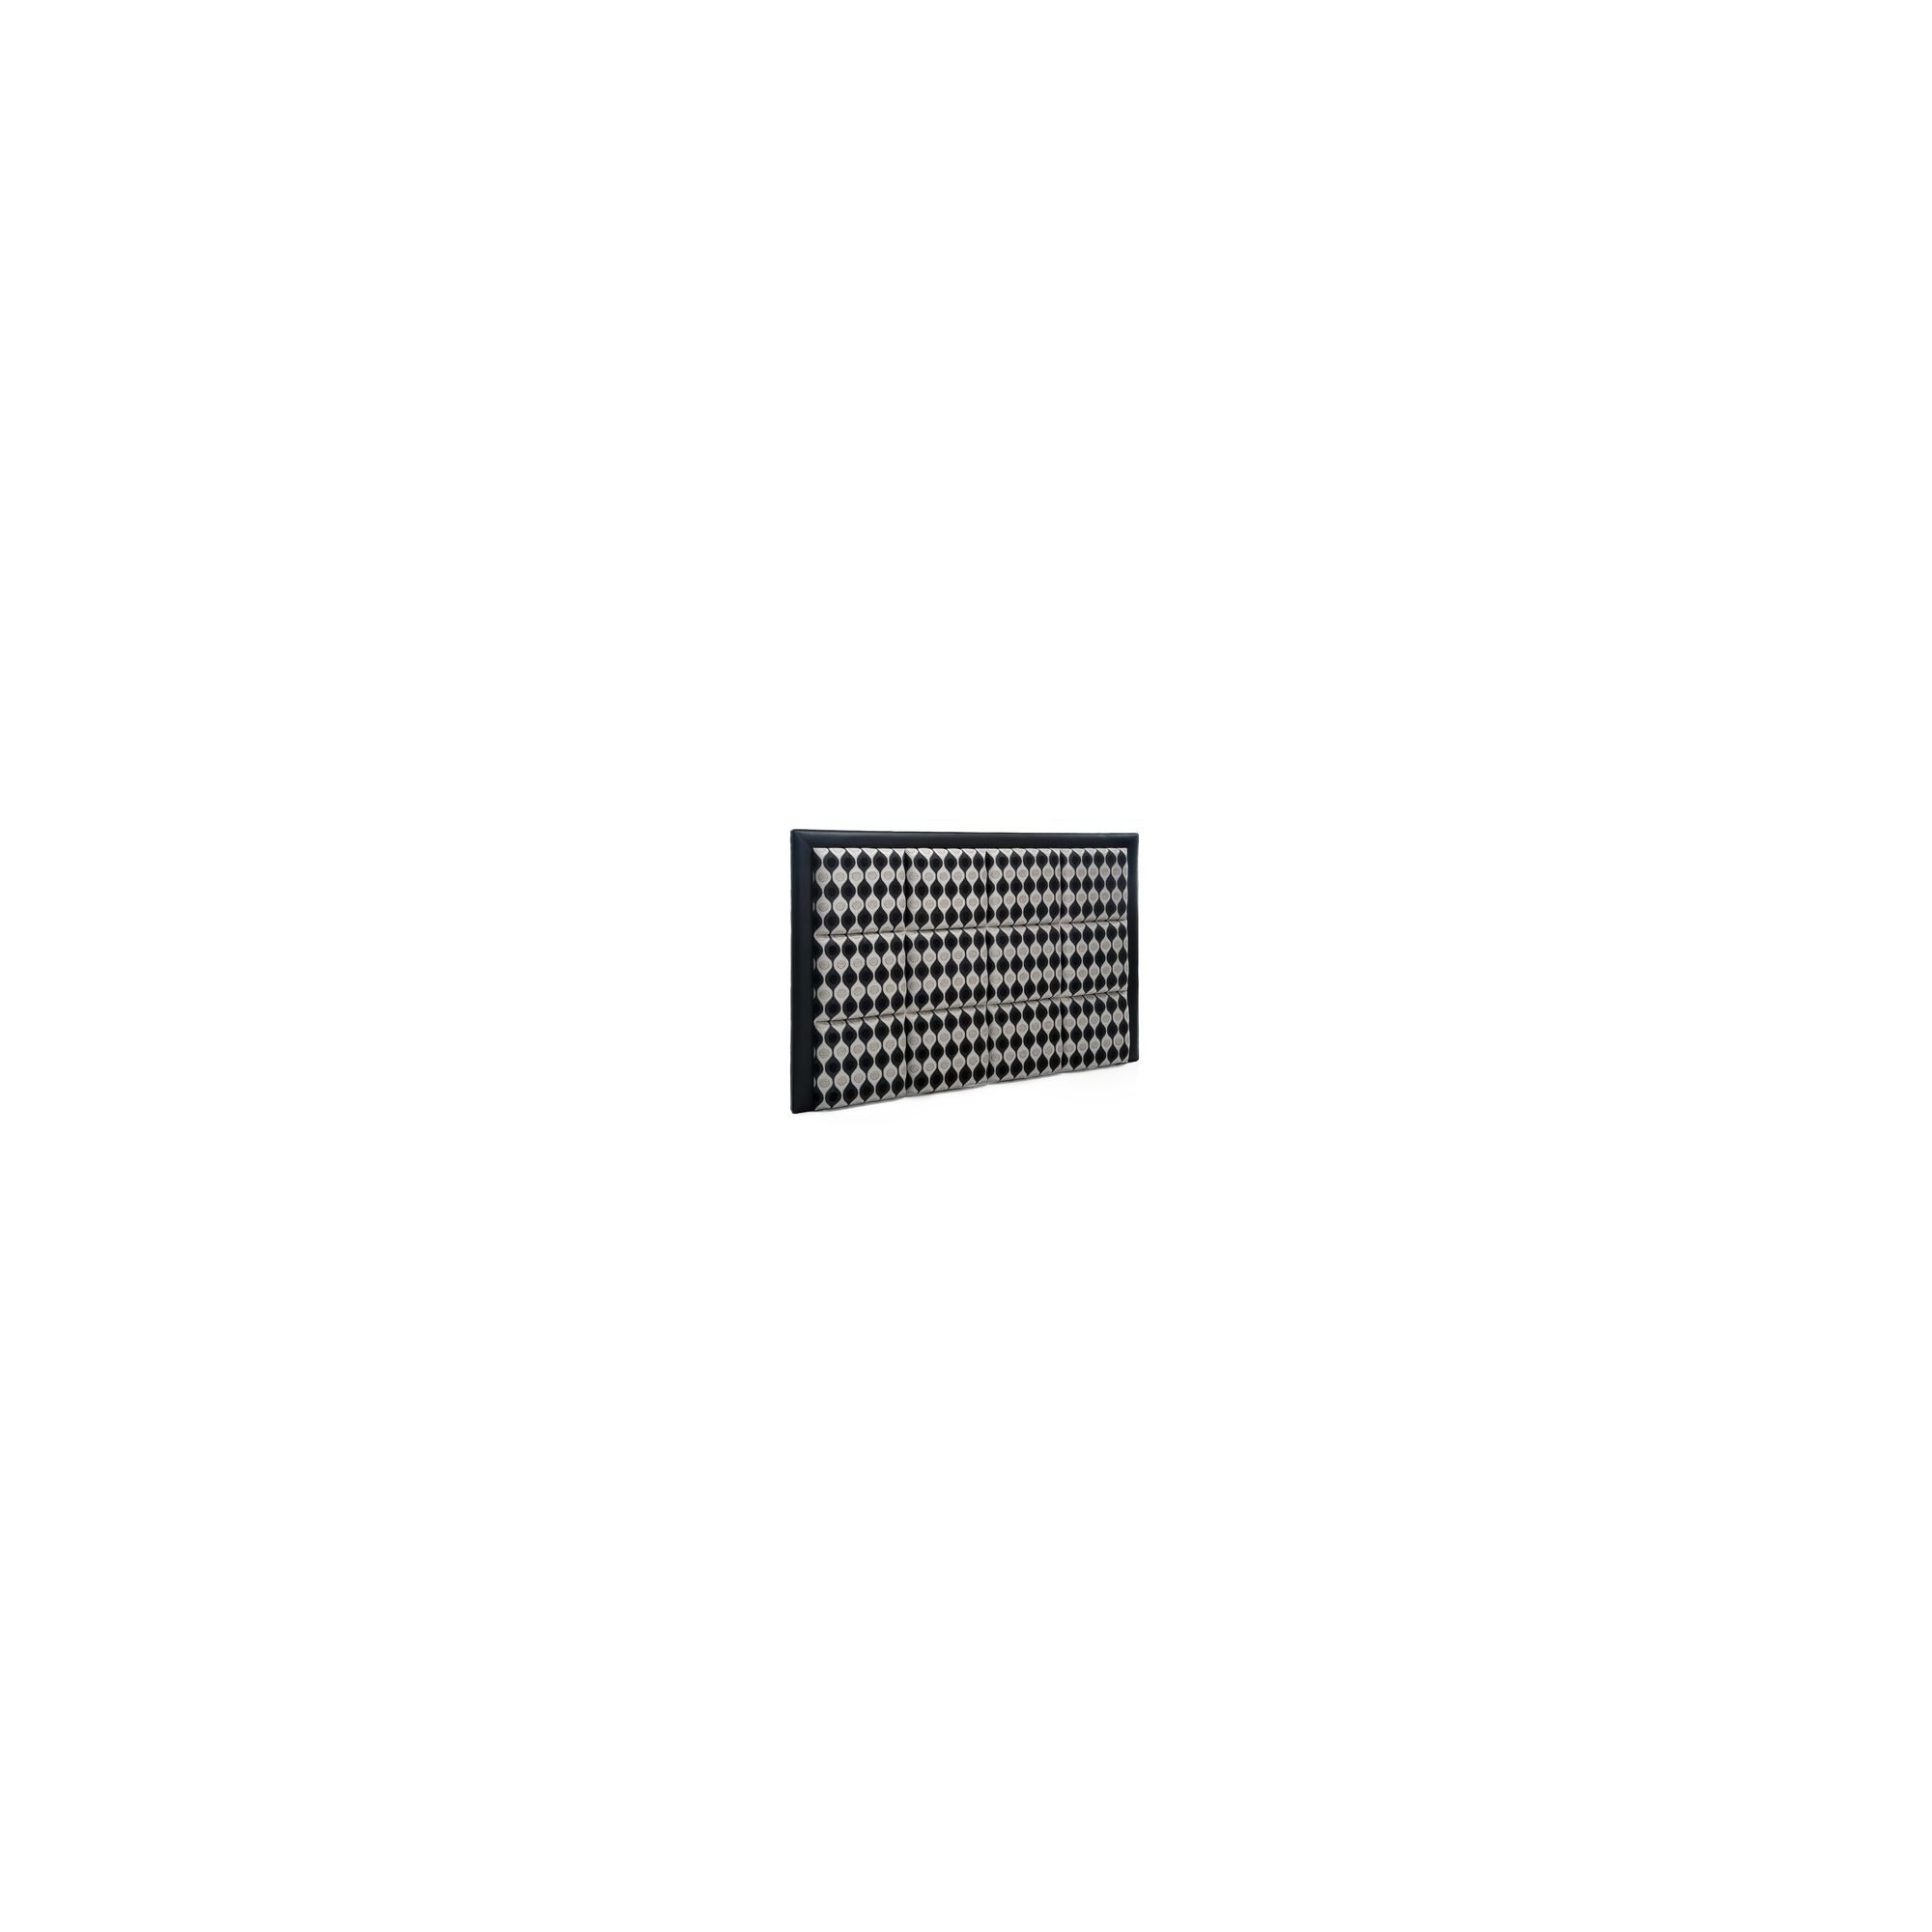 PC Upholstery Kampala Headboard - Ecru - 3' Single at Tesco Direct